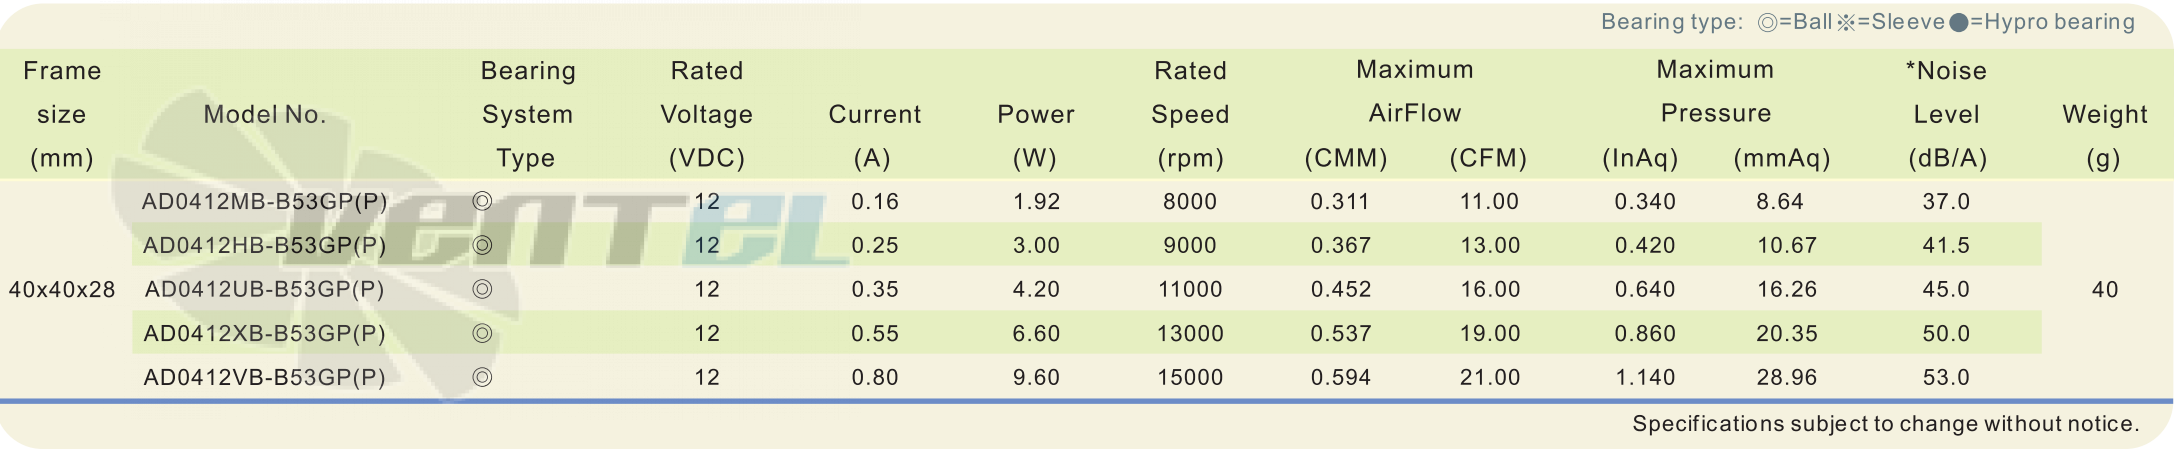 Рабочие параметры и характеристики ADDA AD0412UB-B53GP 40x40x28 DC